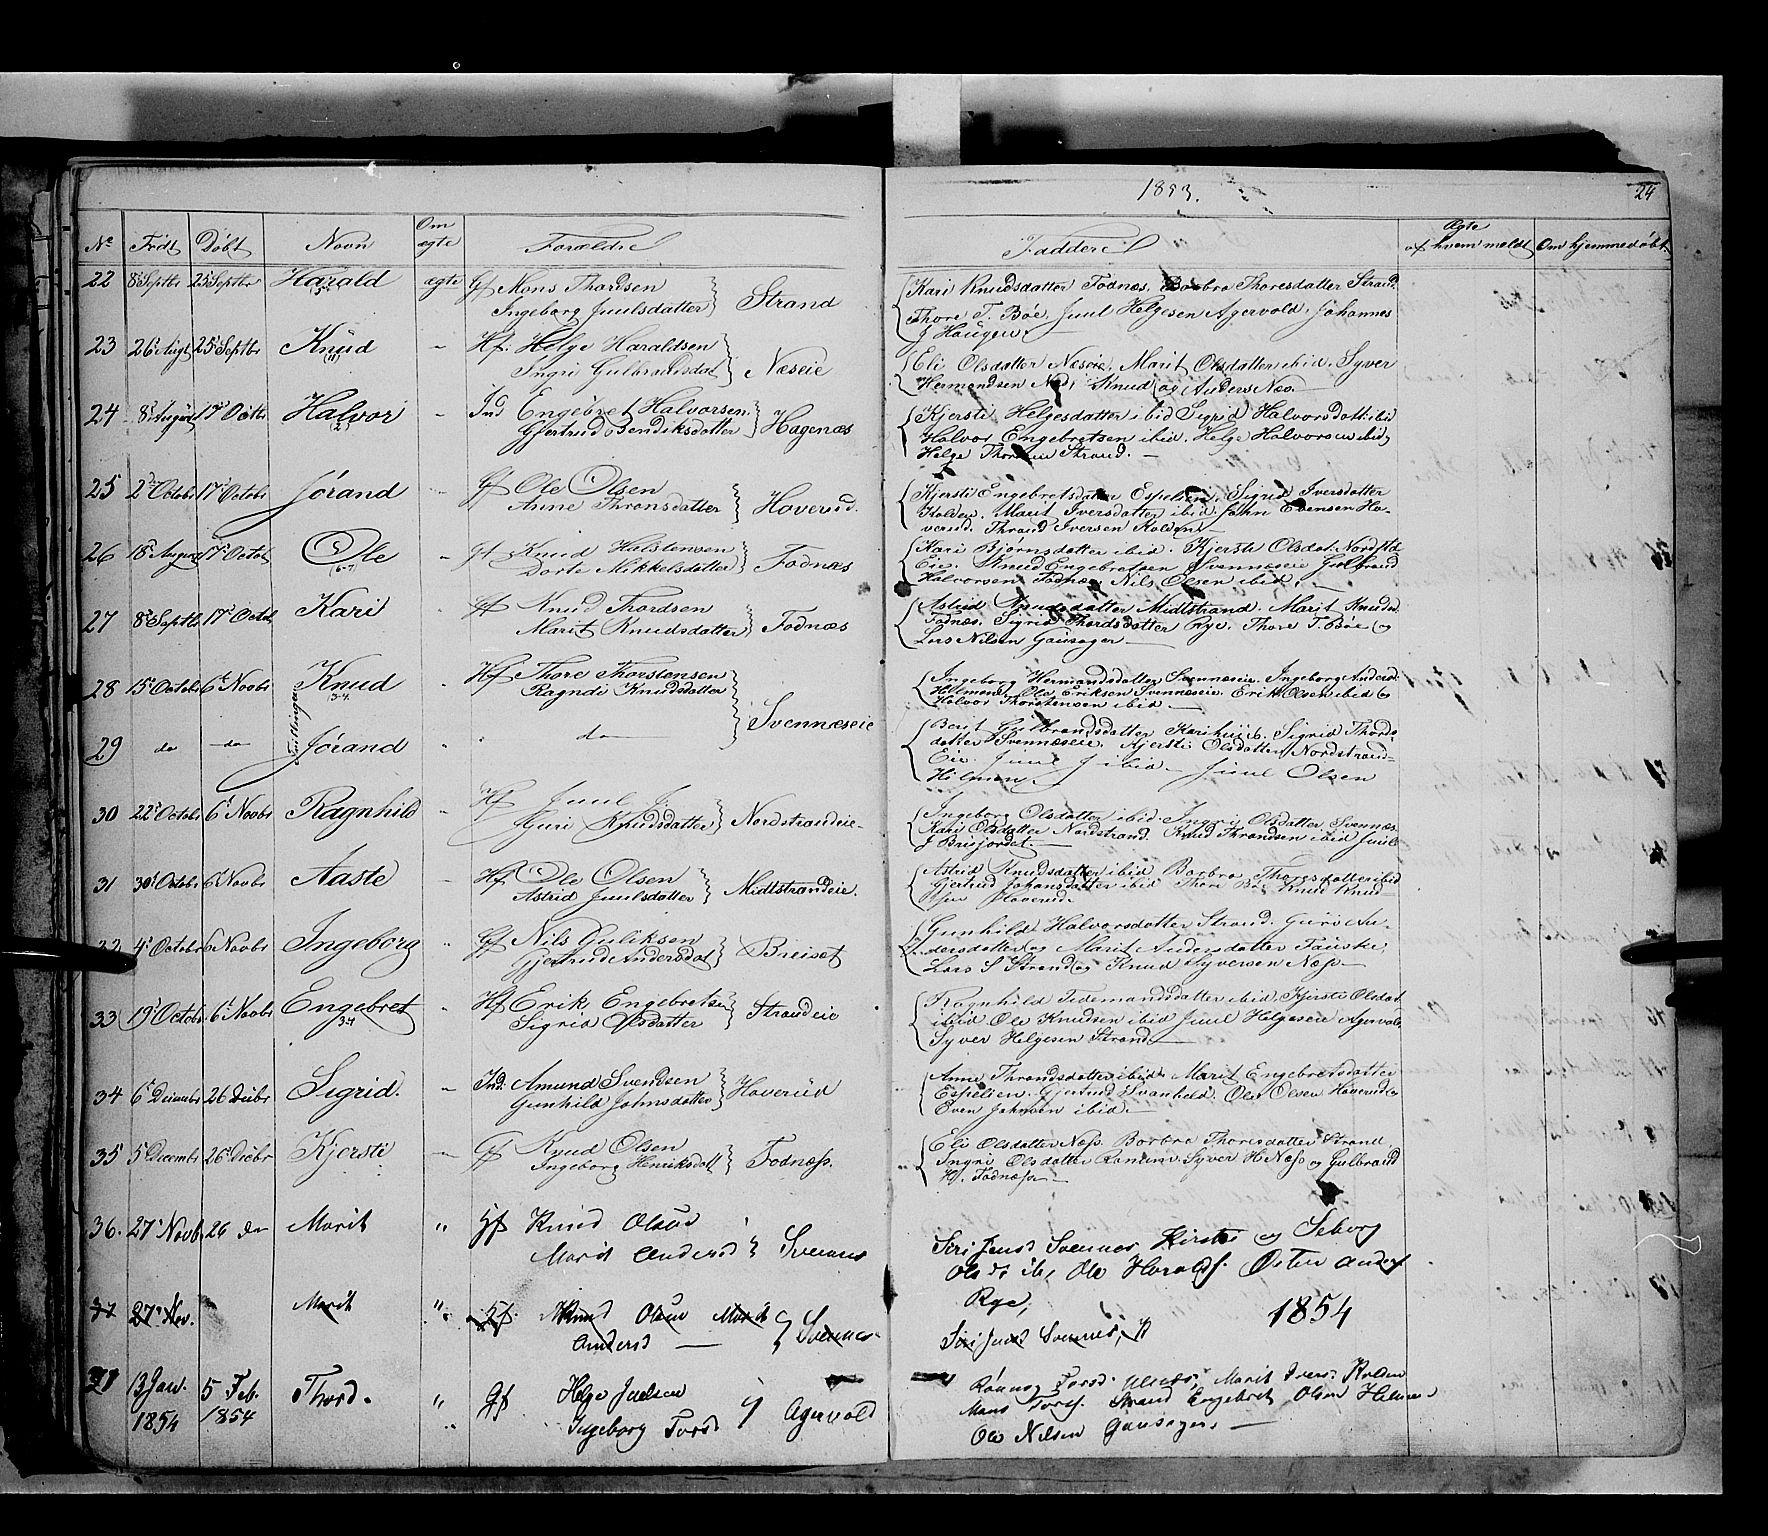 SAH, Nord-Aurdal prestekontor, Ministerialbok nr. 5, 1842-1863, s. 24